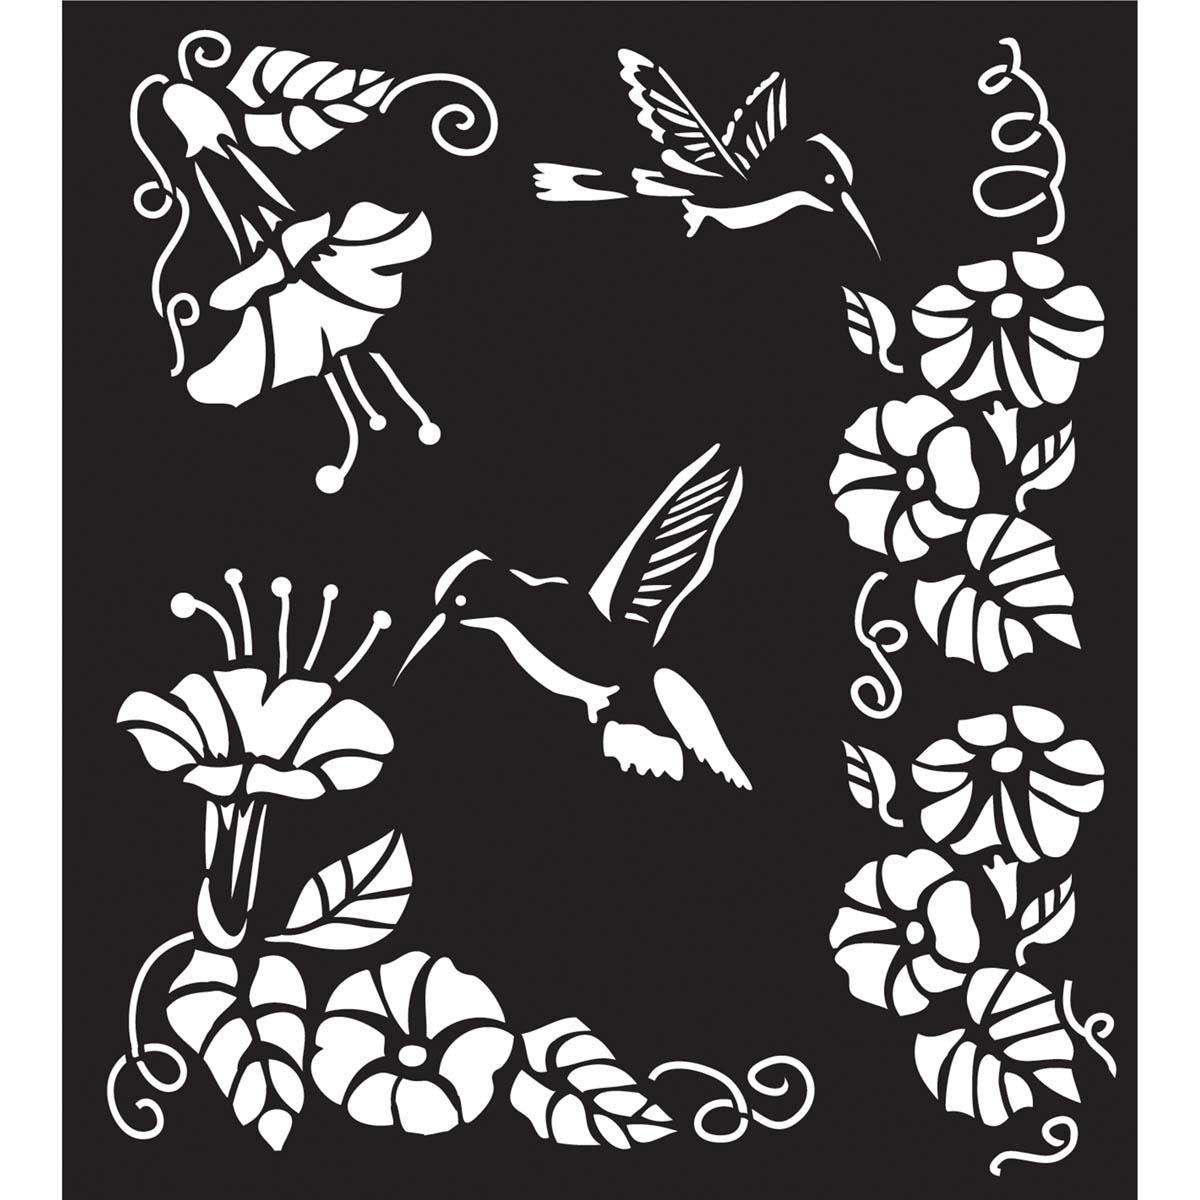 FolkArt ® Painting Stencils - Large - Hummingbird - 31487